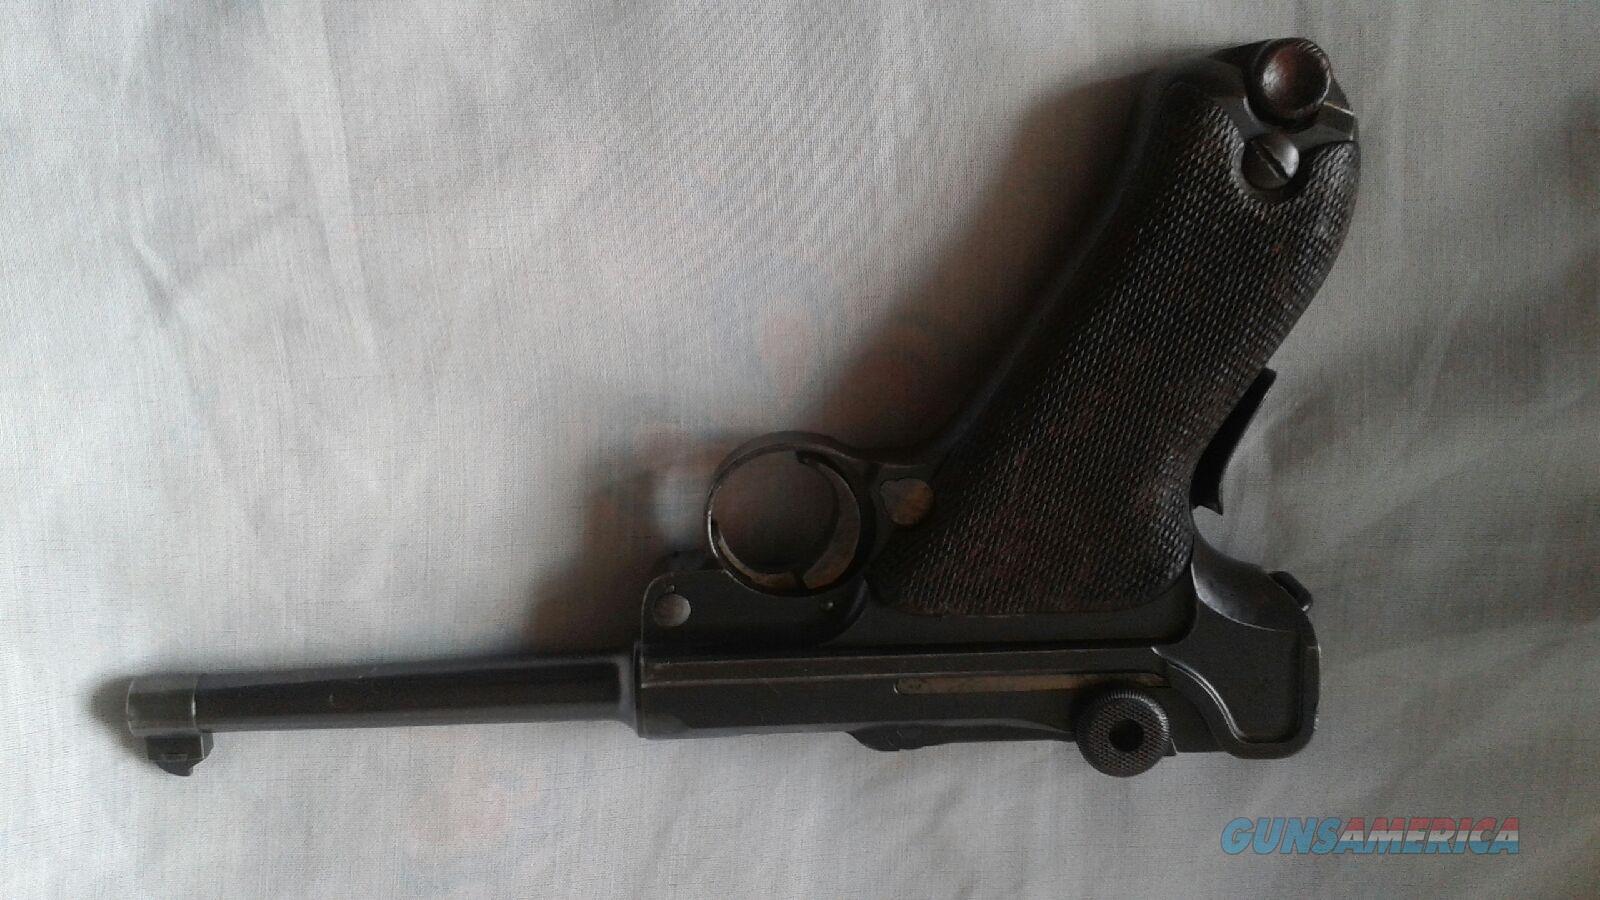 Lugar DWM 1906 .30 cal Brazil cod 243  Guns > Pistols > Luger Pistols